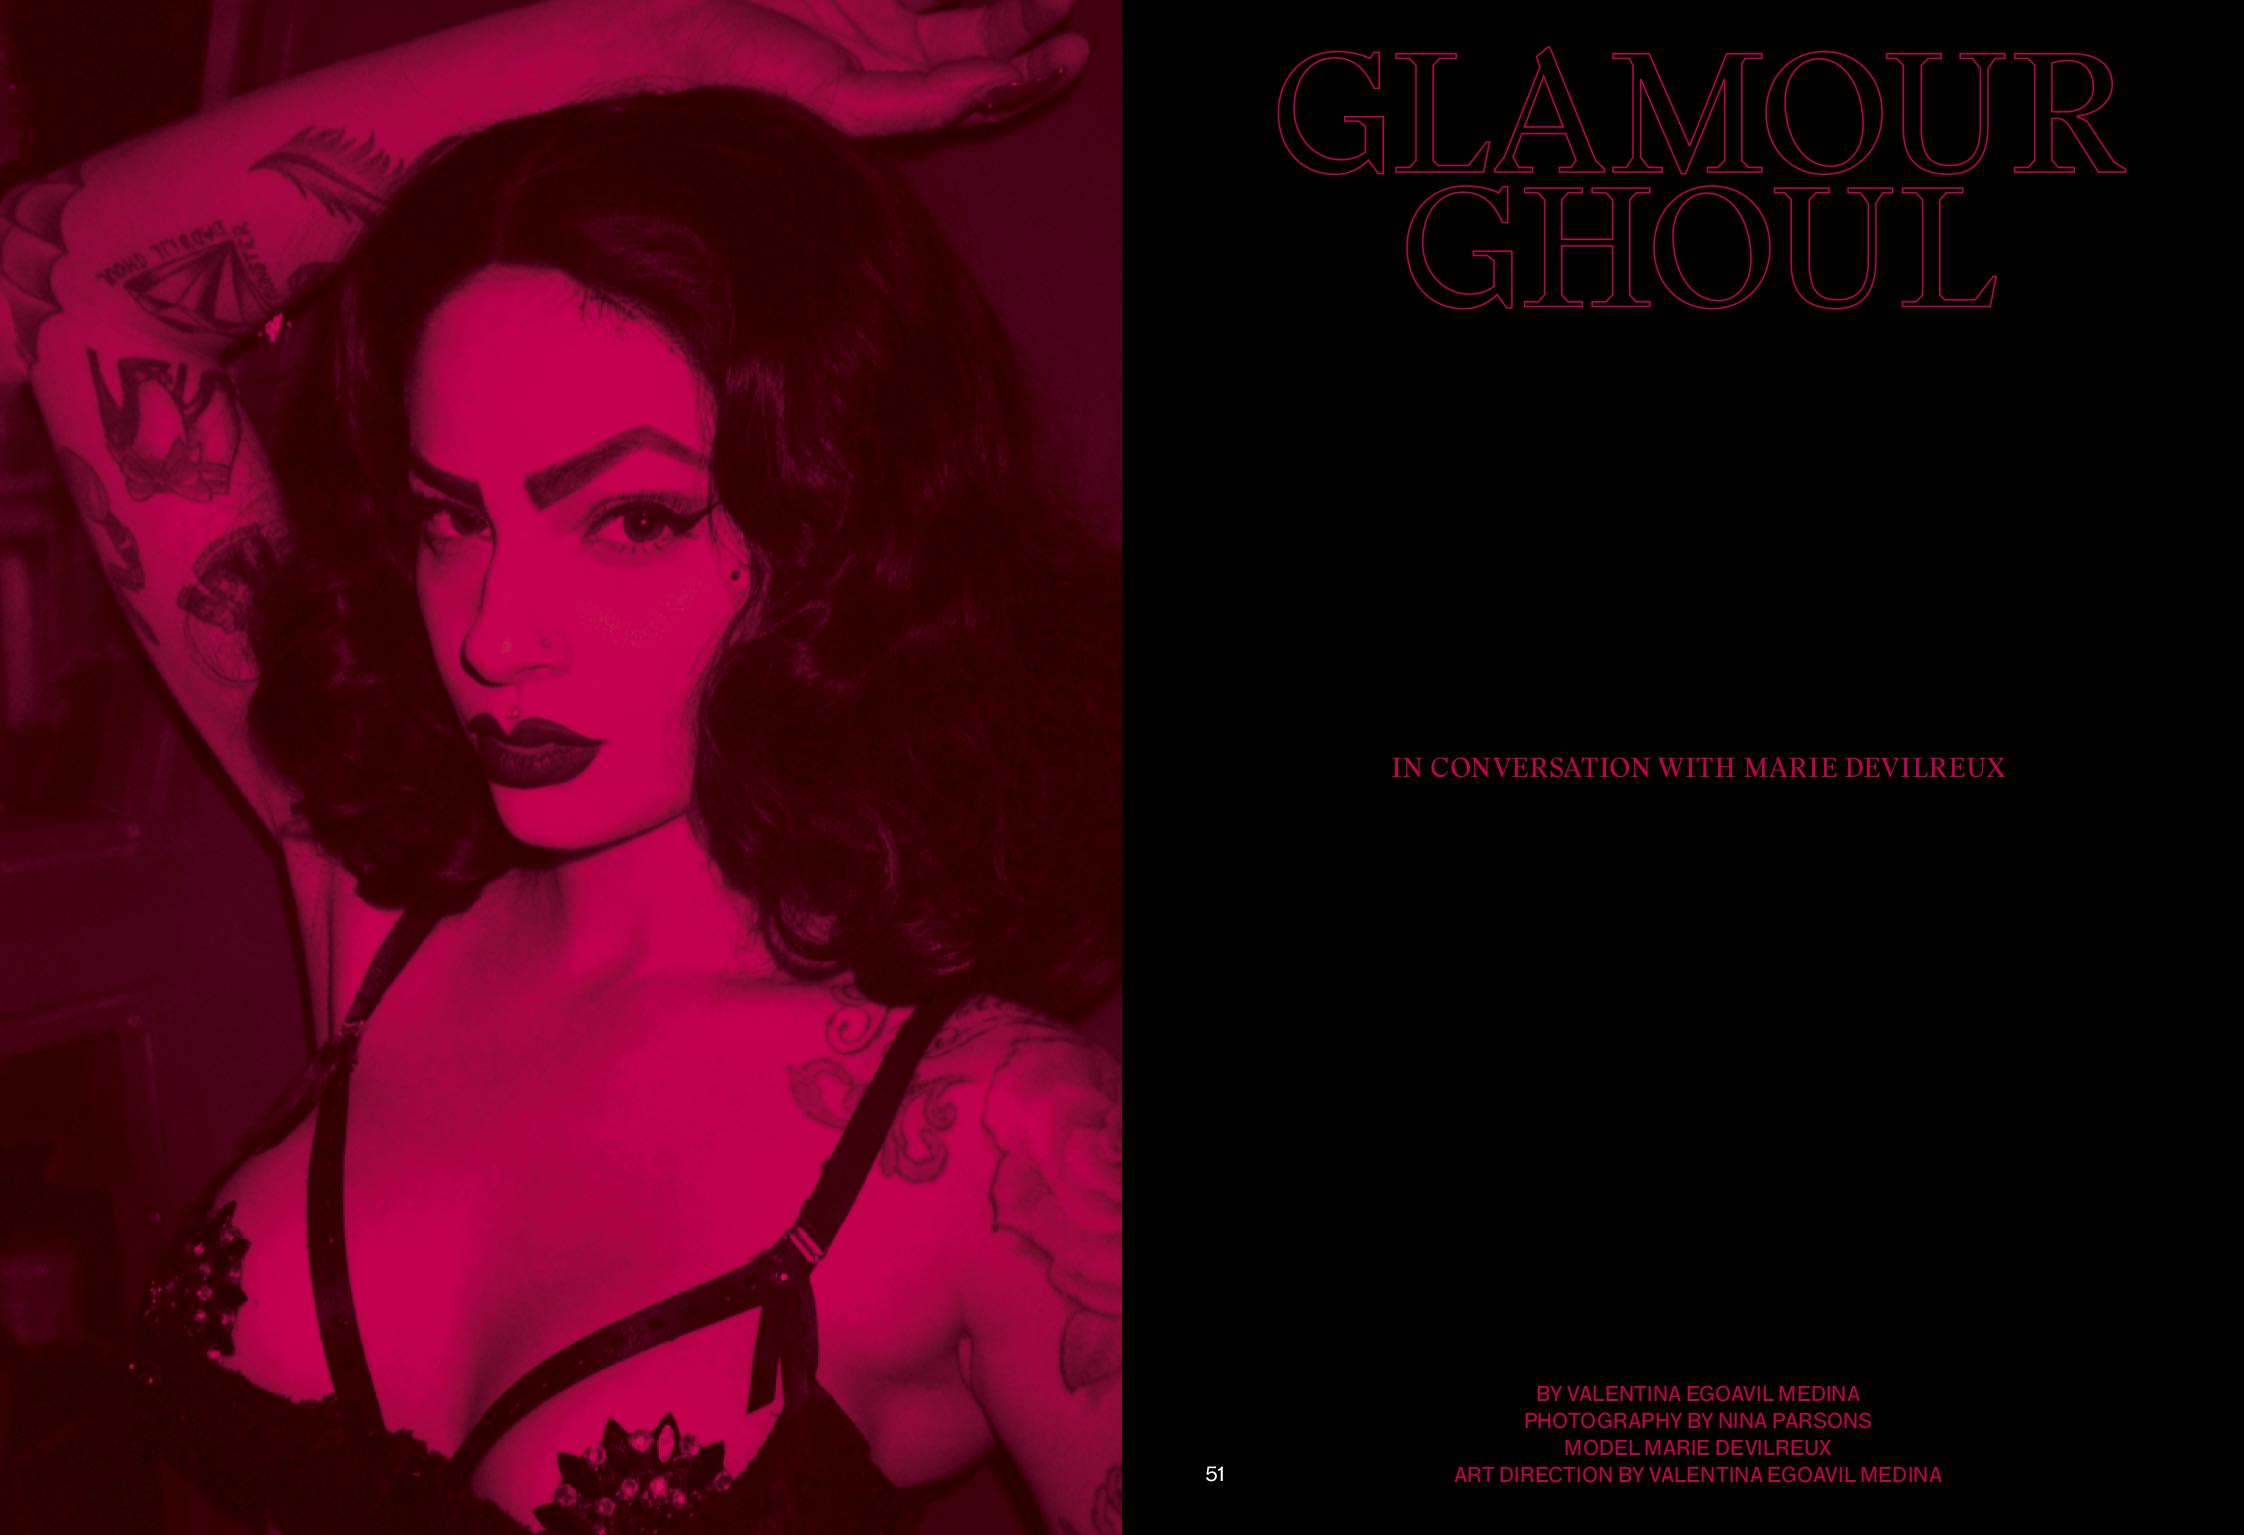 GGlowres1.jpg